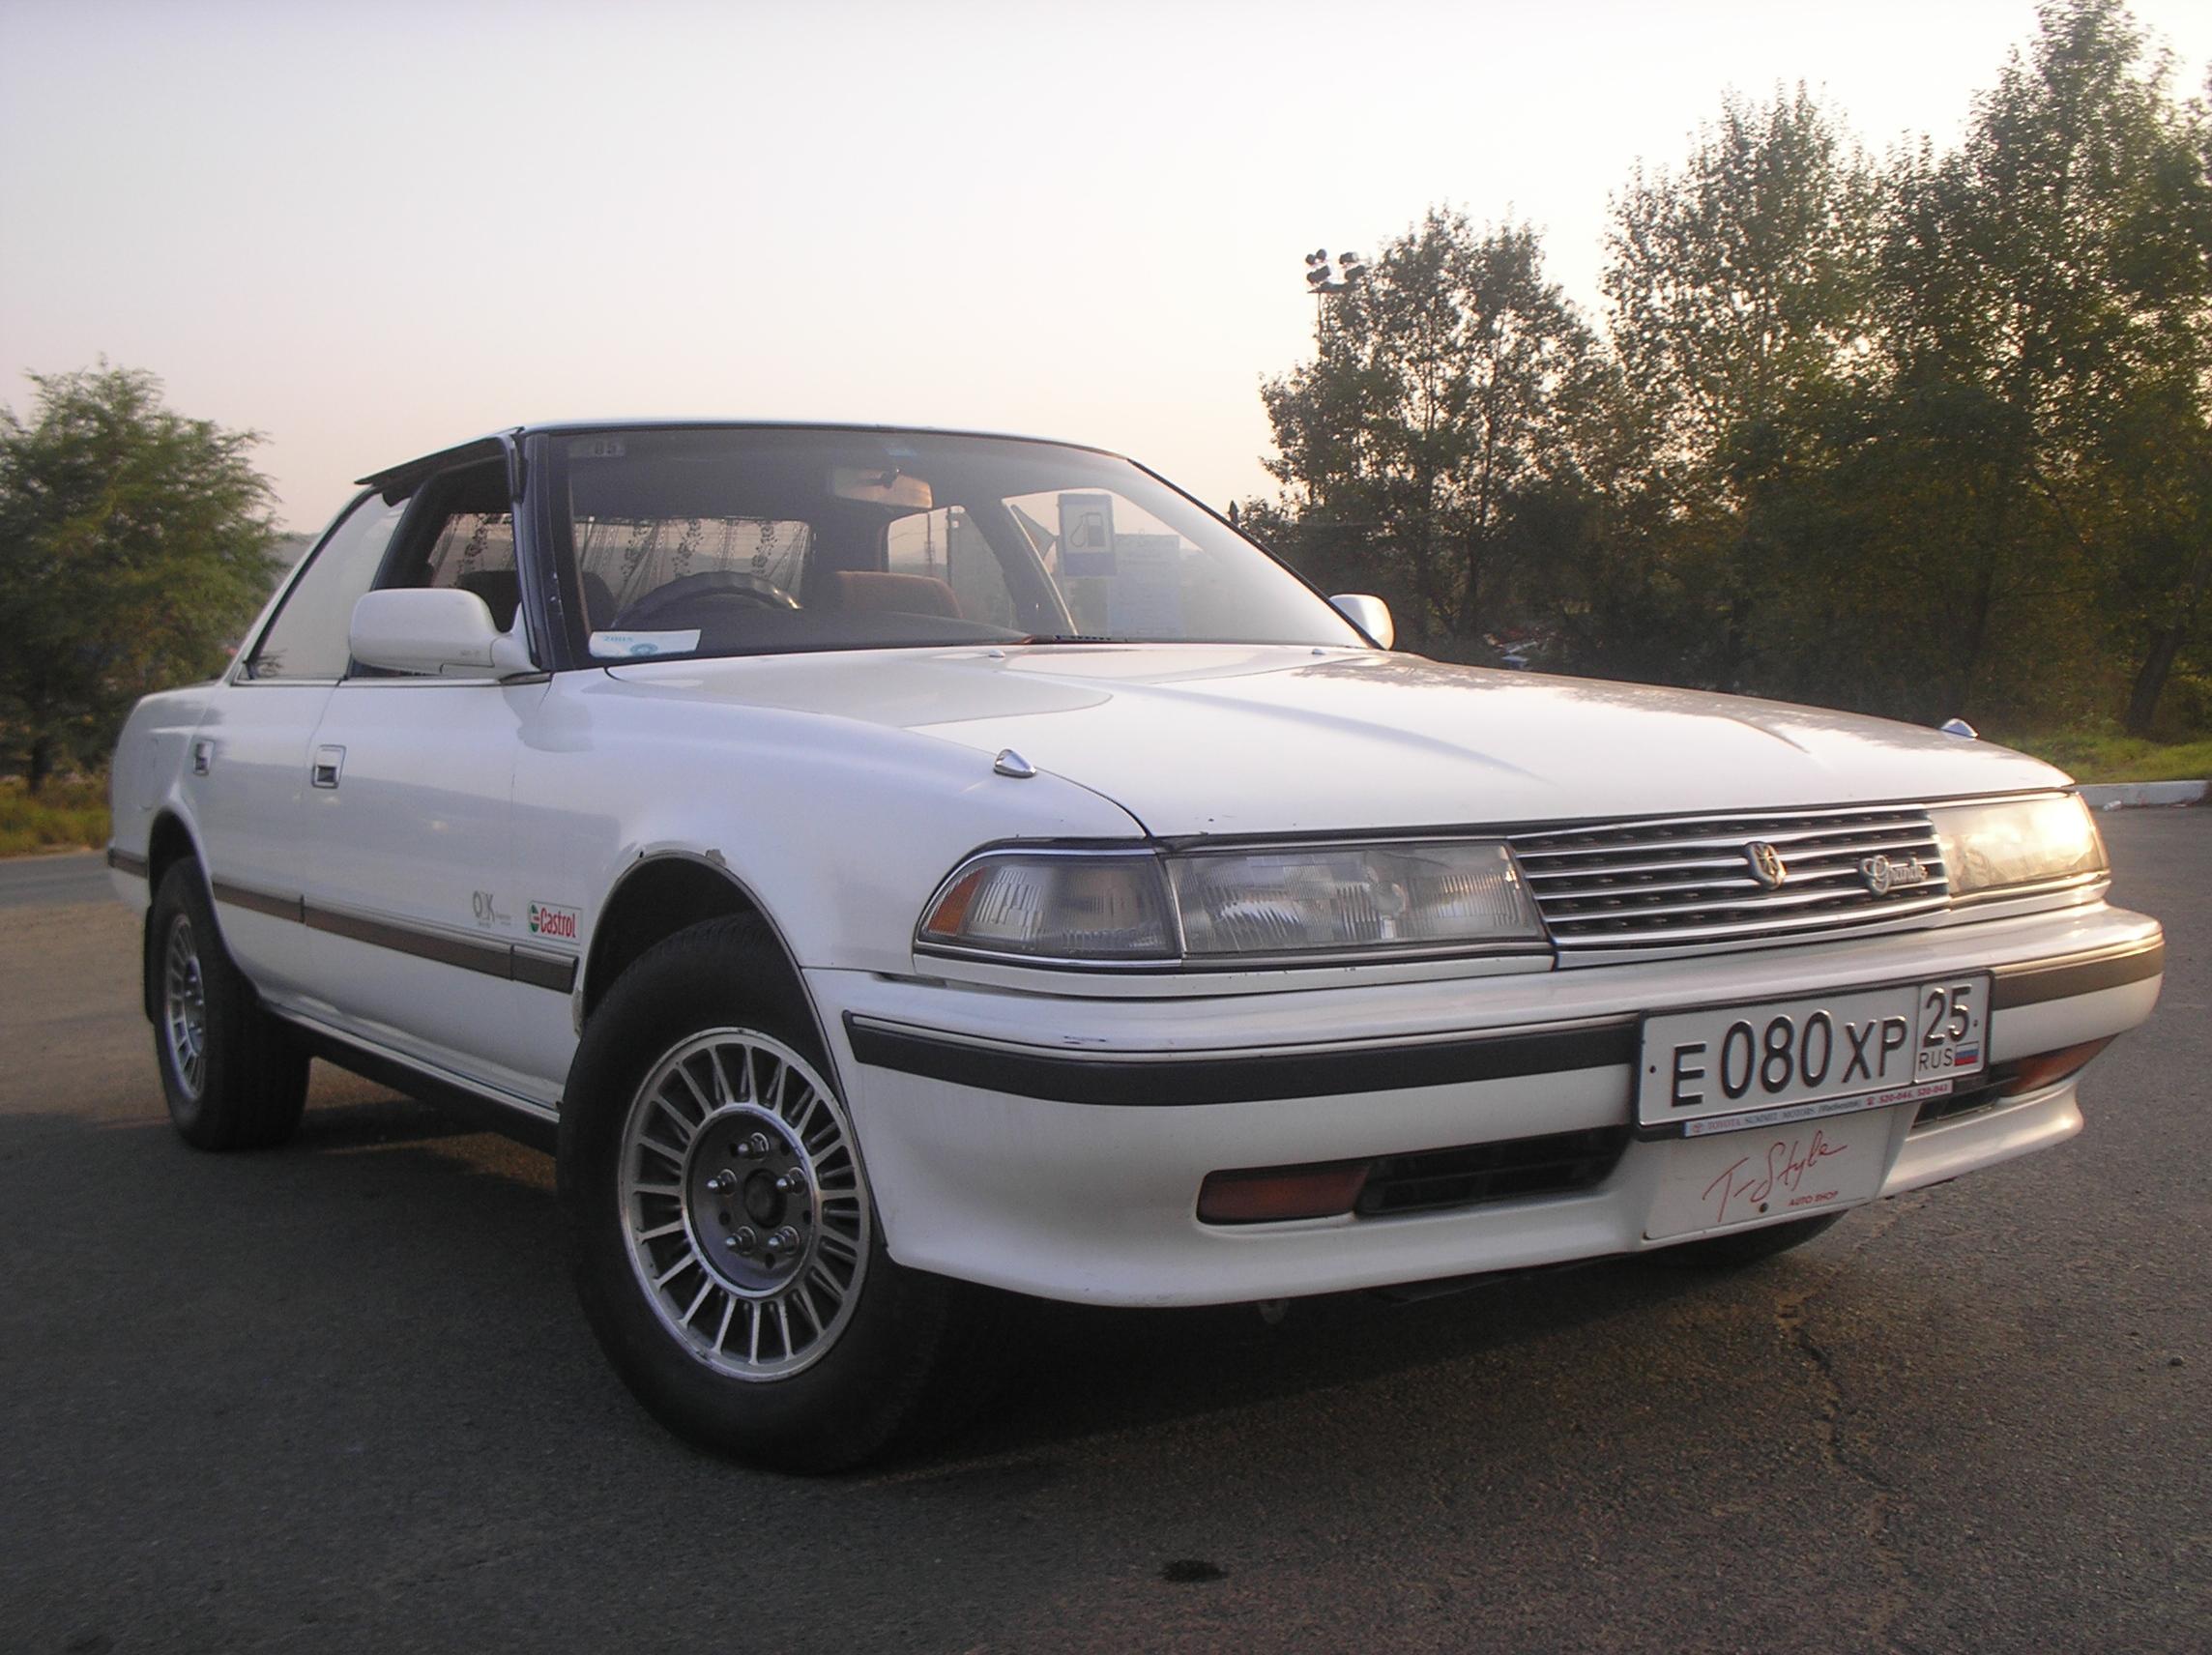 Wiring Diagram 1989 Ford Festiva 1992 Auto 89 1990